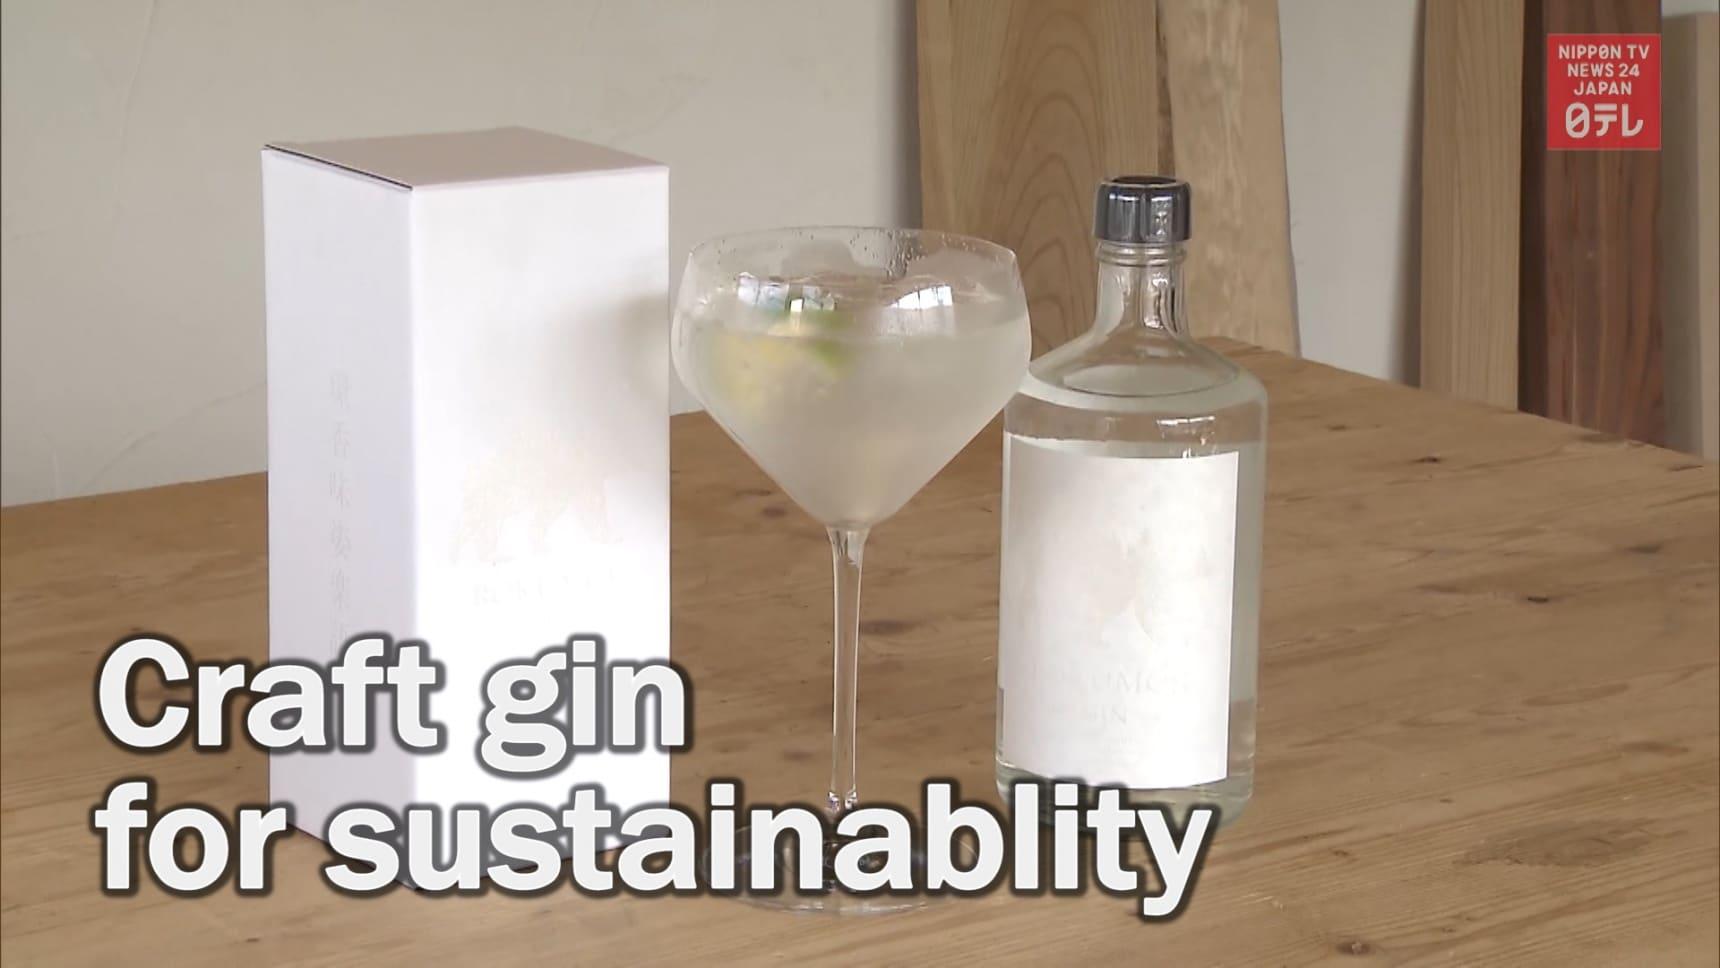 Niigata Craft Gin to Promote Sustainability